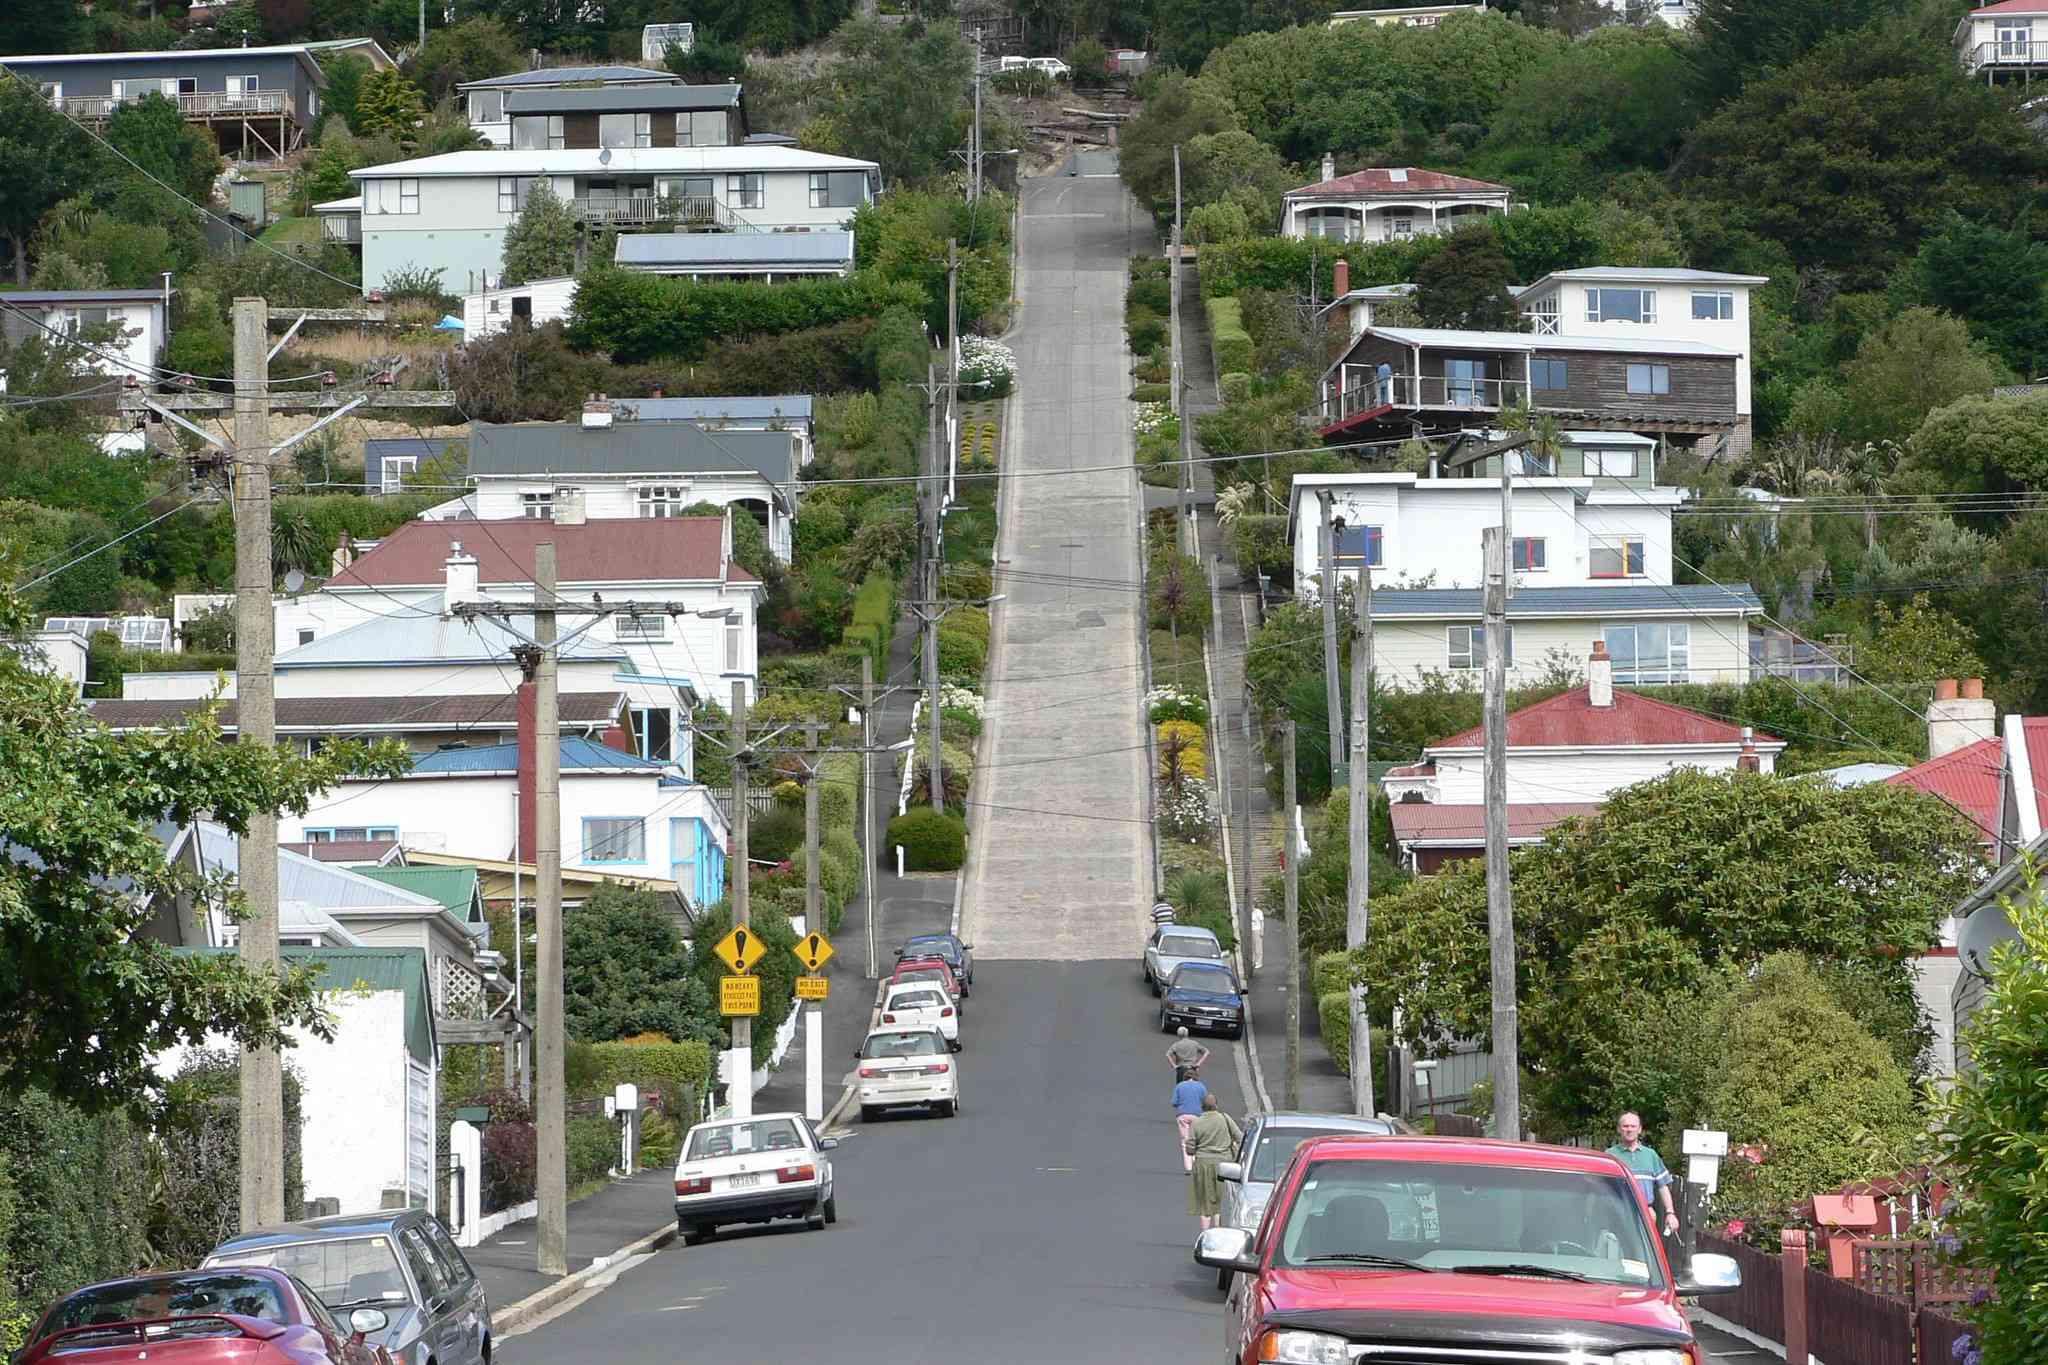 Baldwin Street in Dunedin, New Zealand